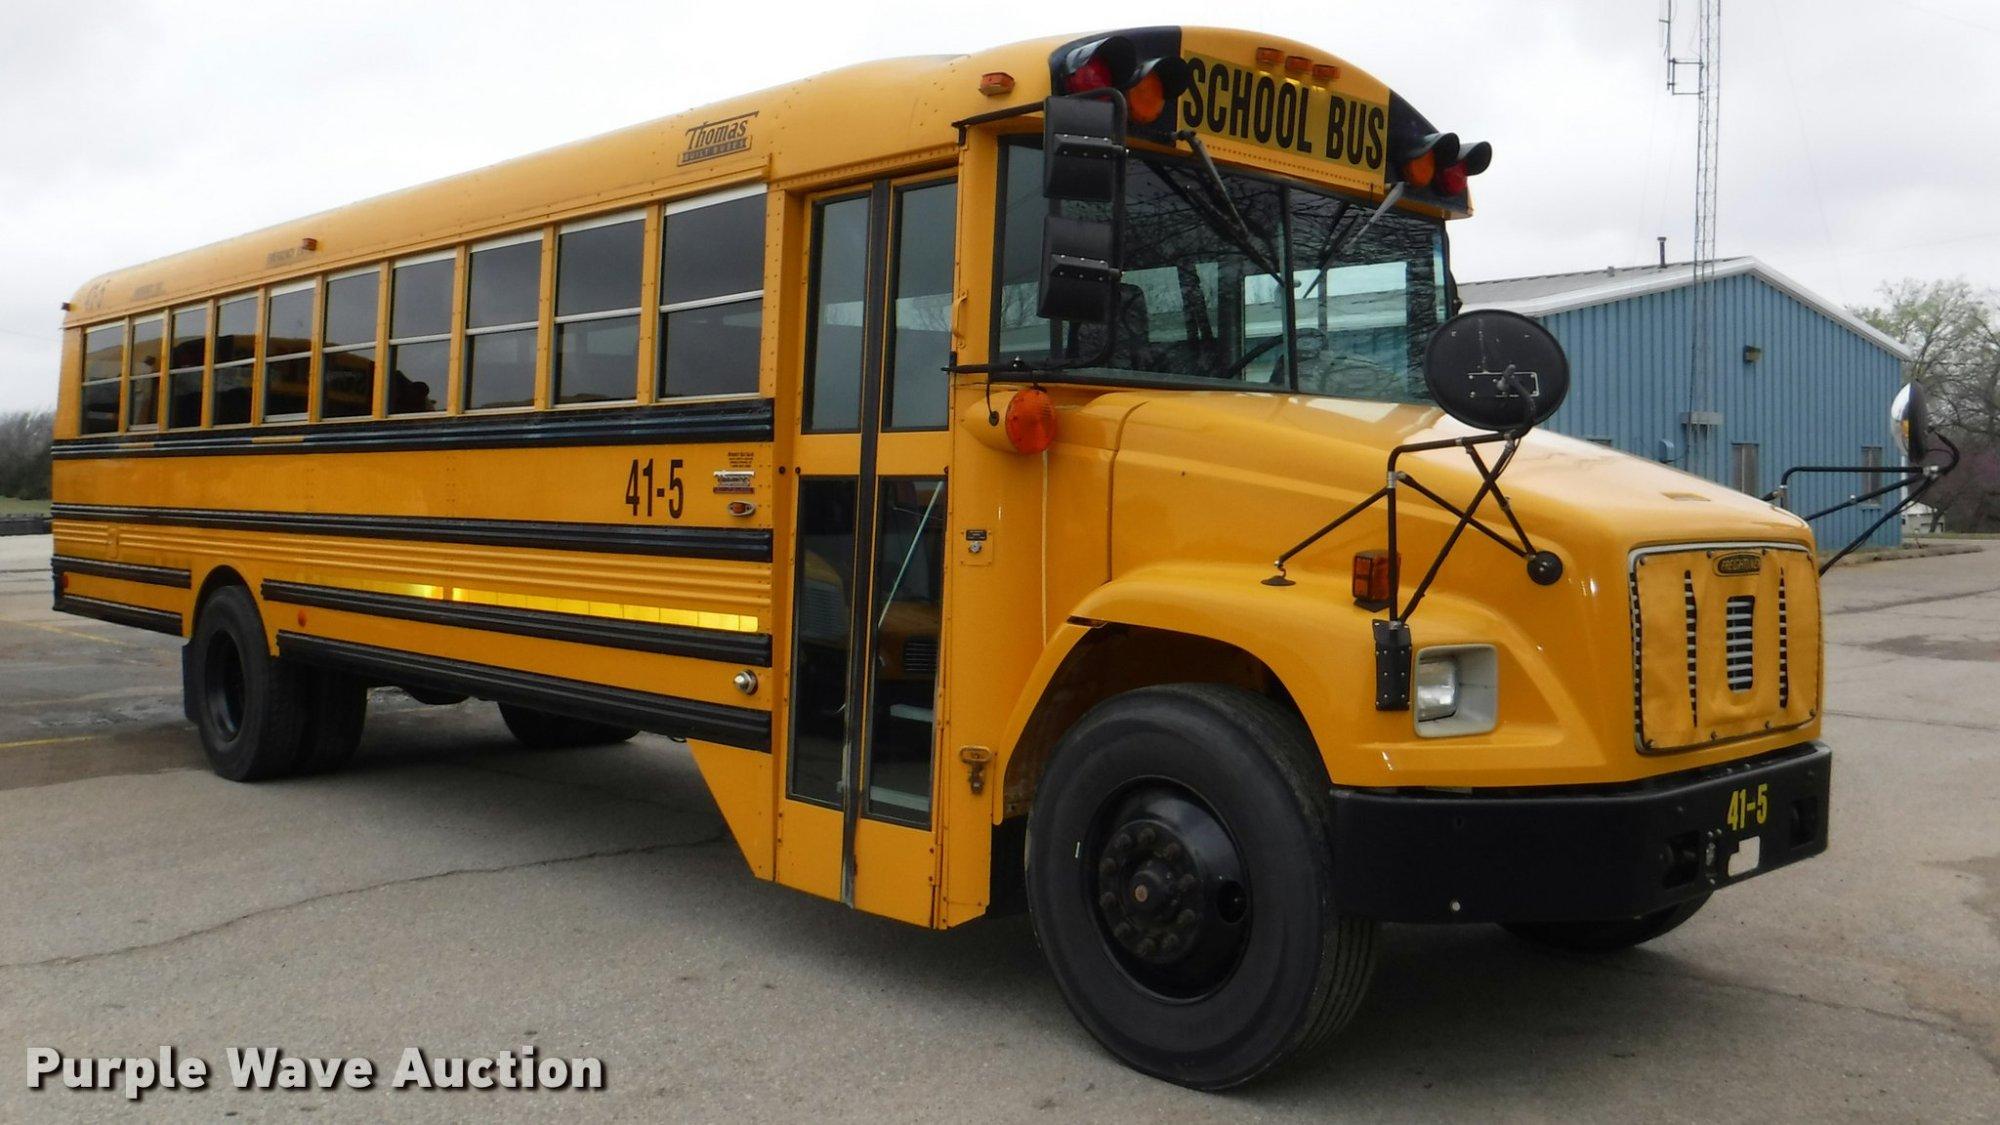 hight resolution of 2003 thomas bus wiring diagram electrical wiring diagrams school bus pre trip diagram thomas built